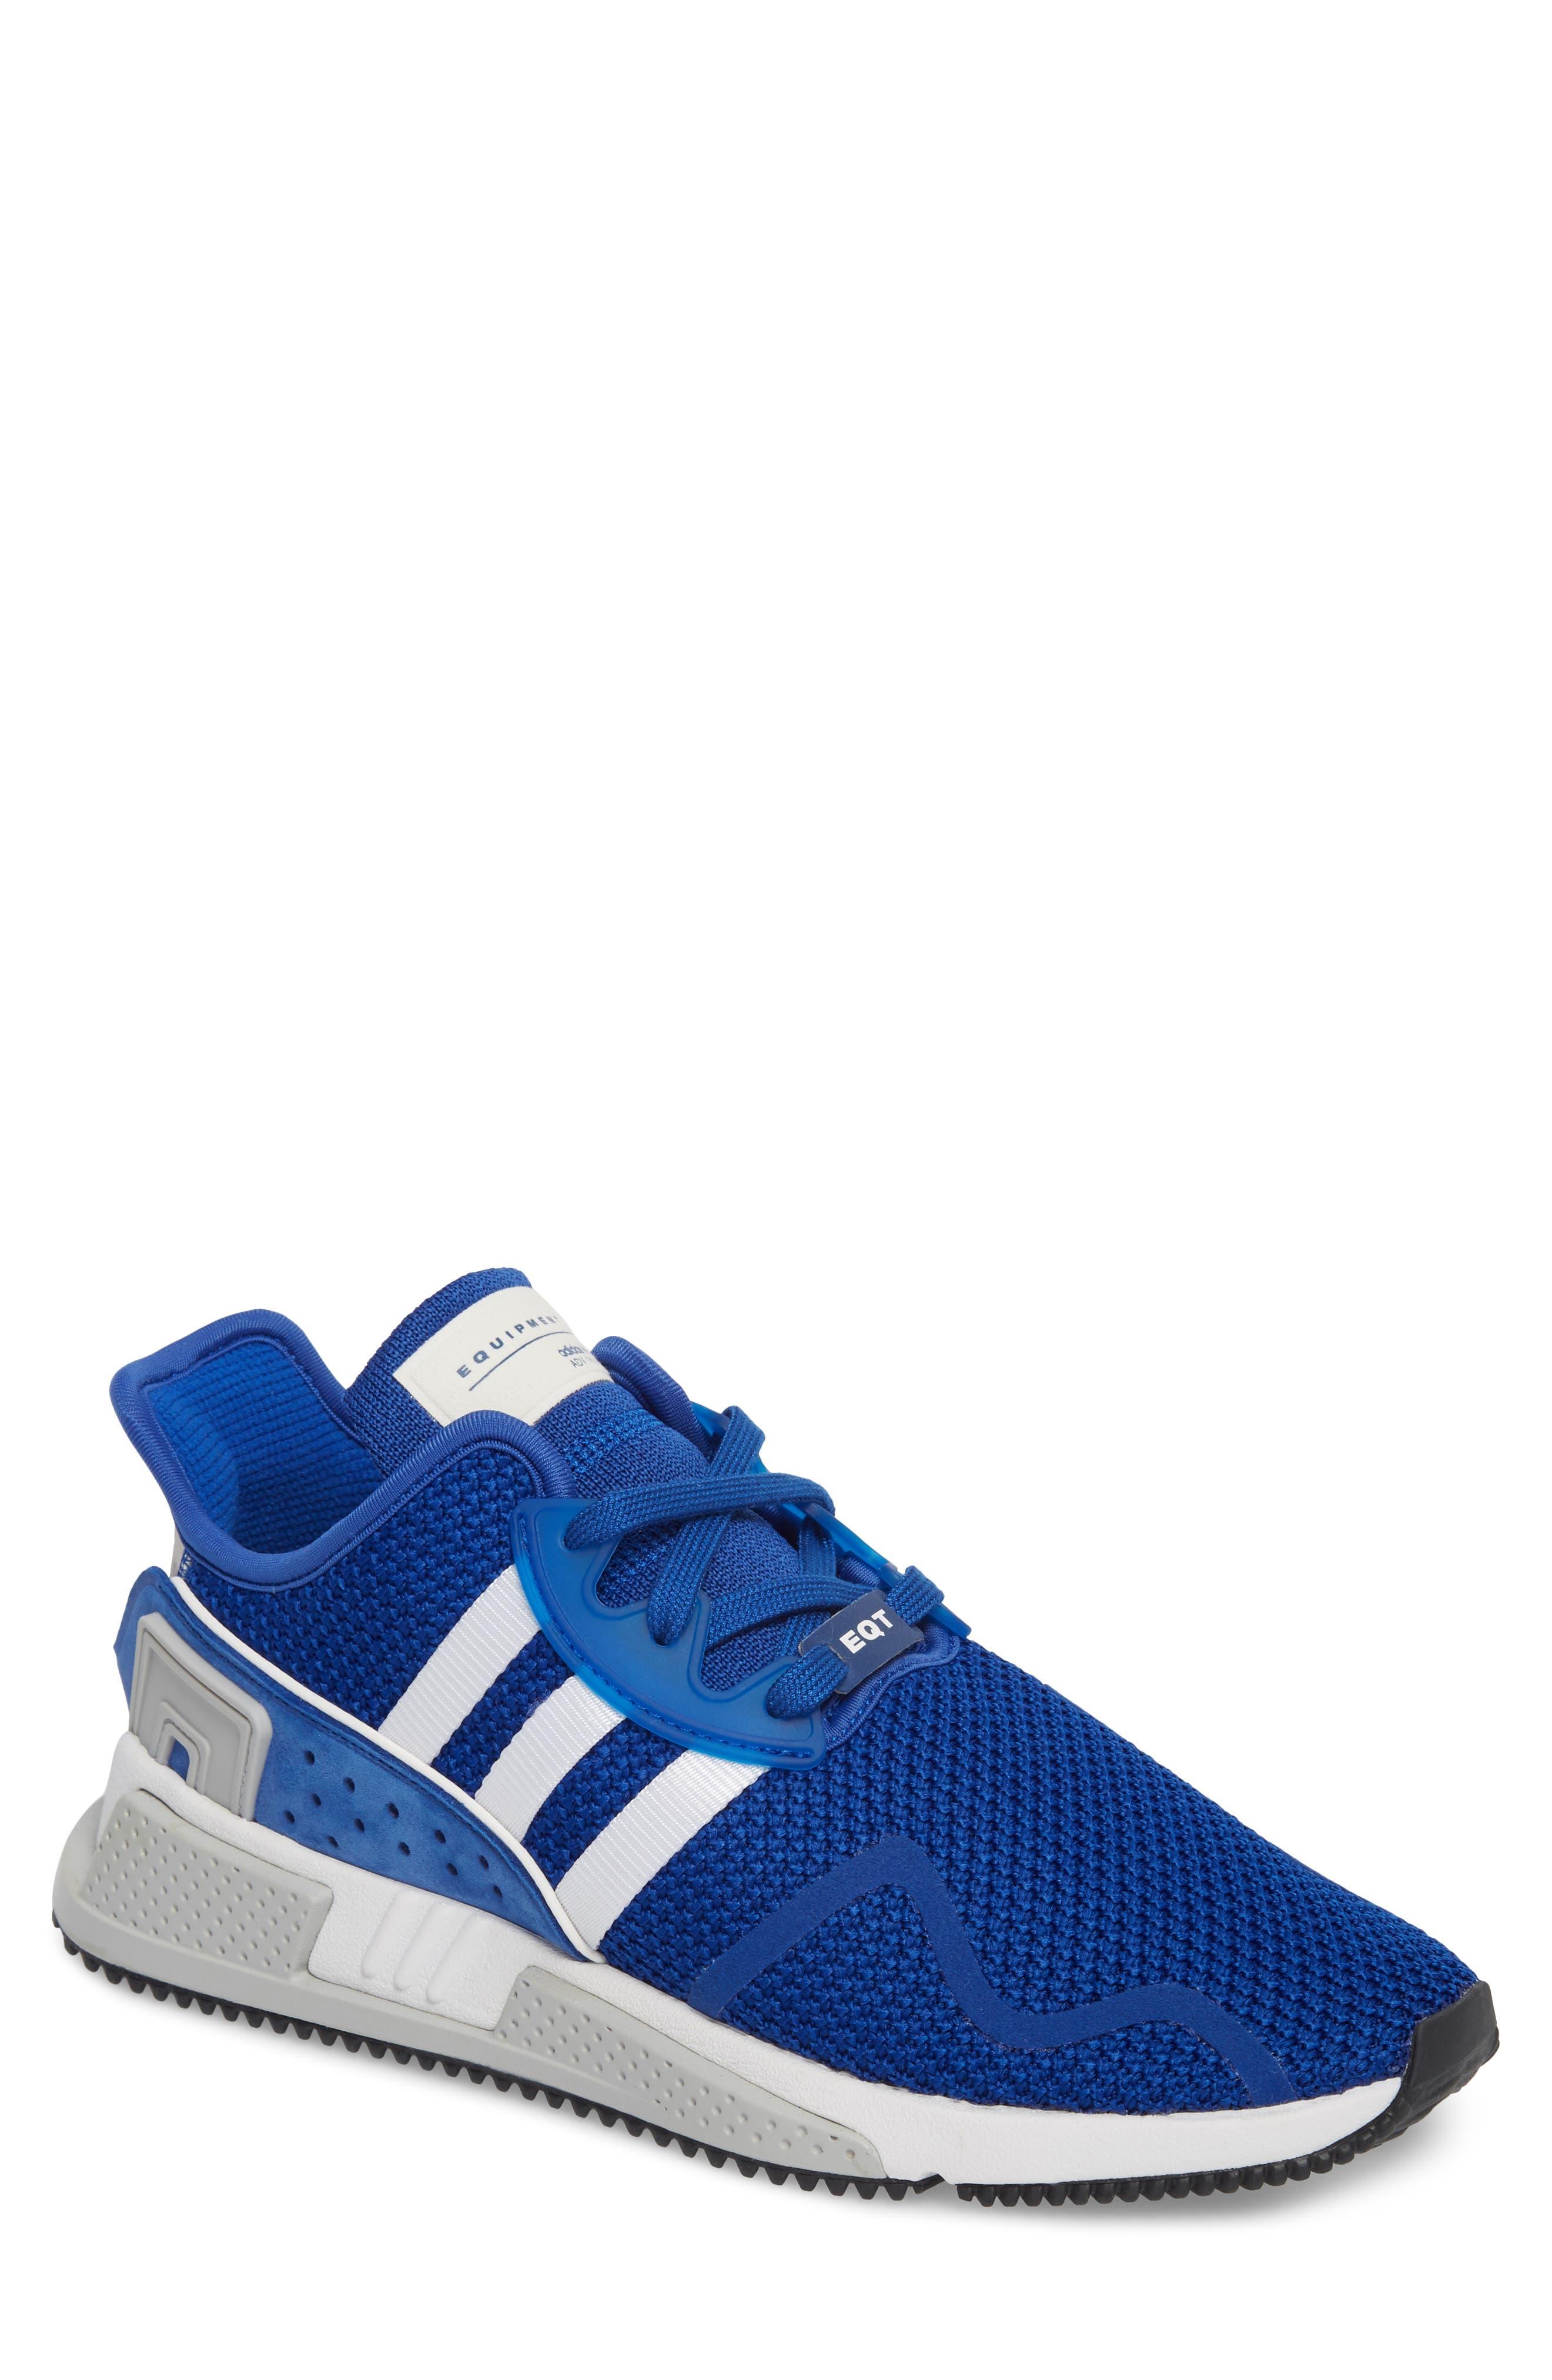 EQT Cushion ADV Sneaker,                         Main,                         color, 400